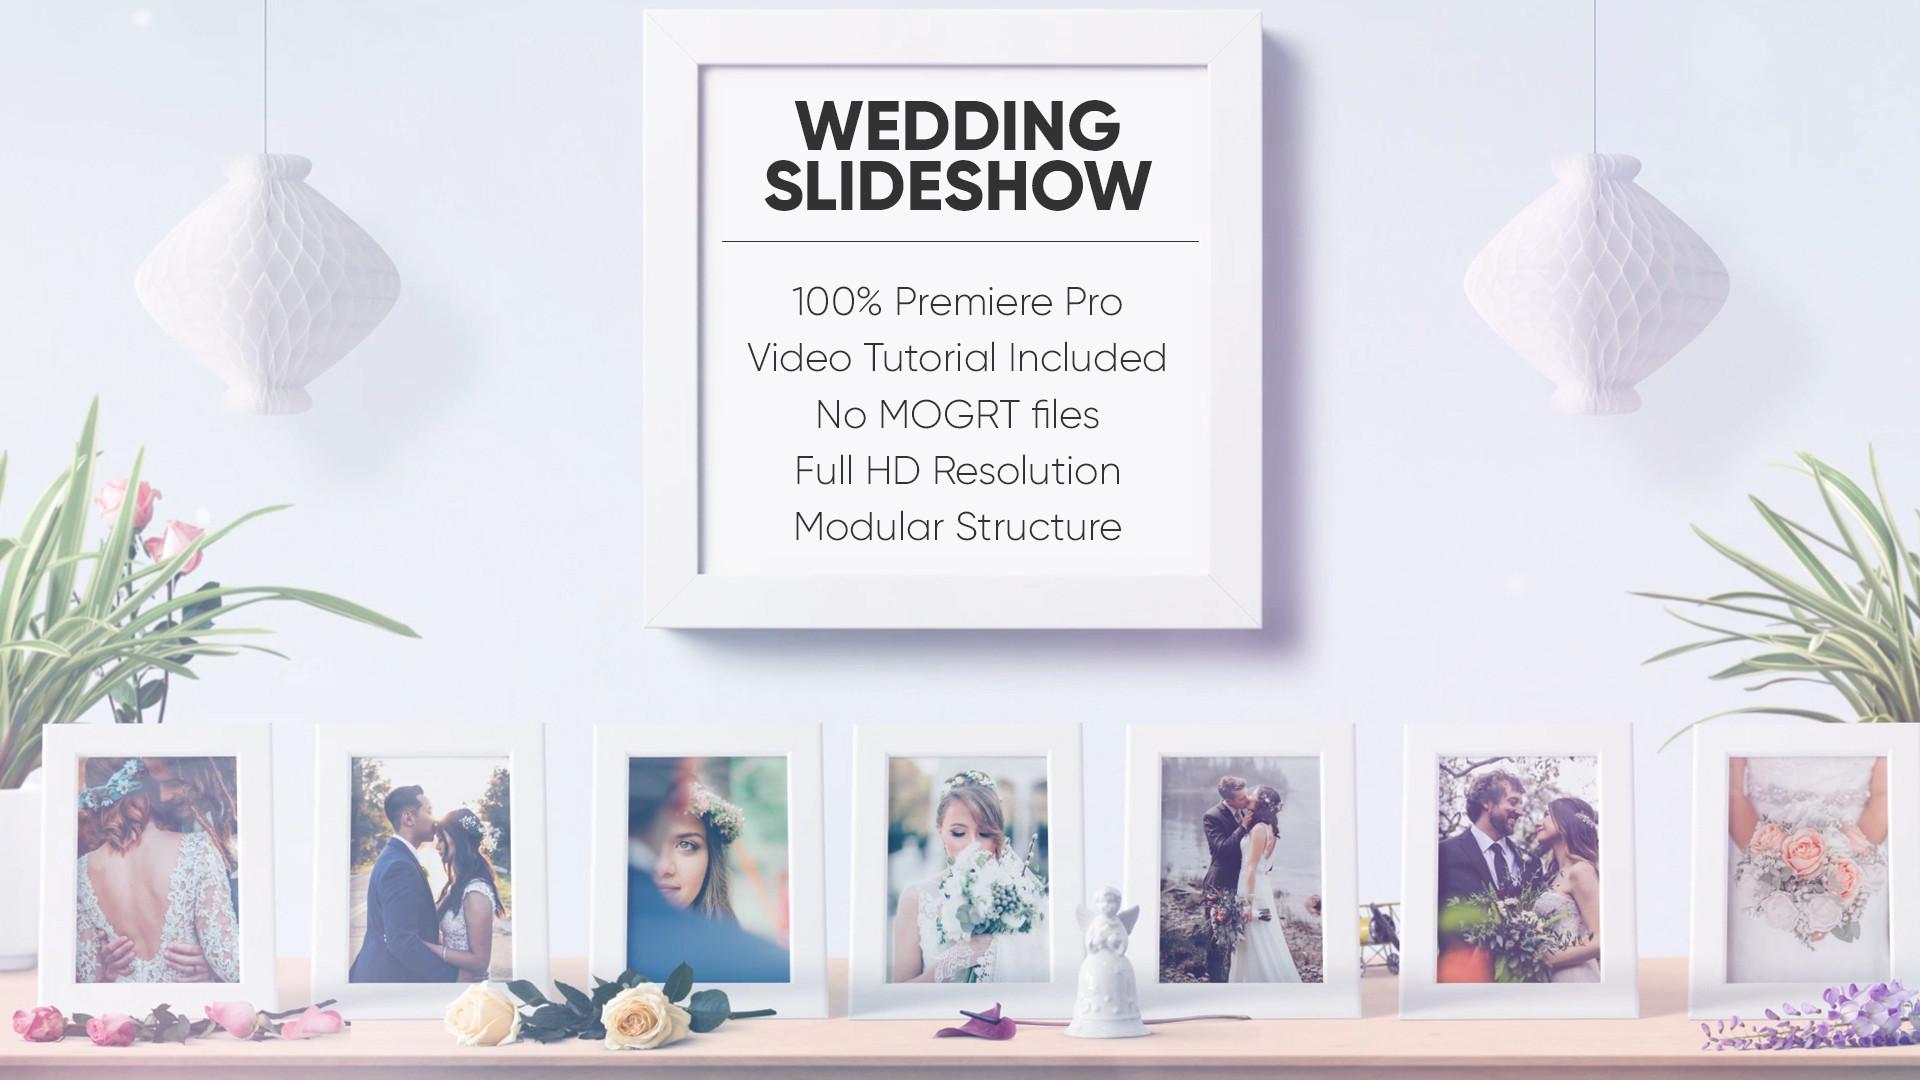 Wedding Slideshow - Premiere Pro Templates 134102